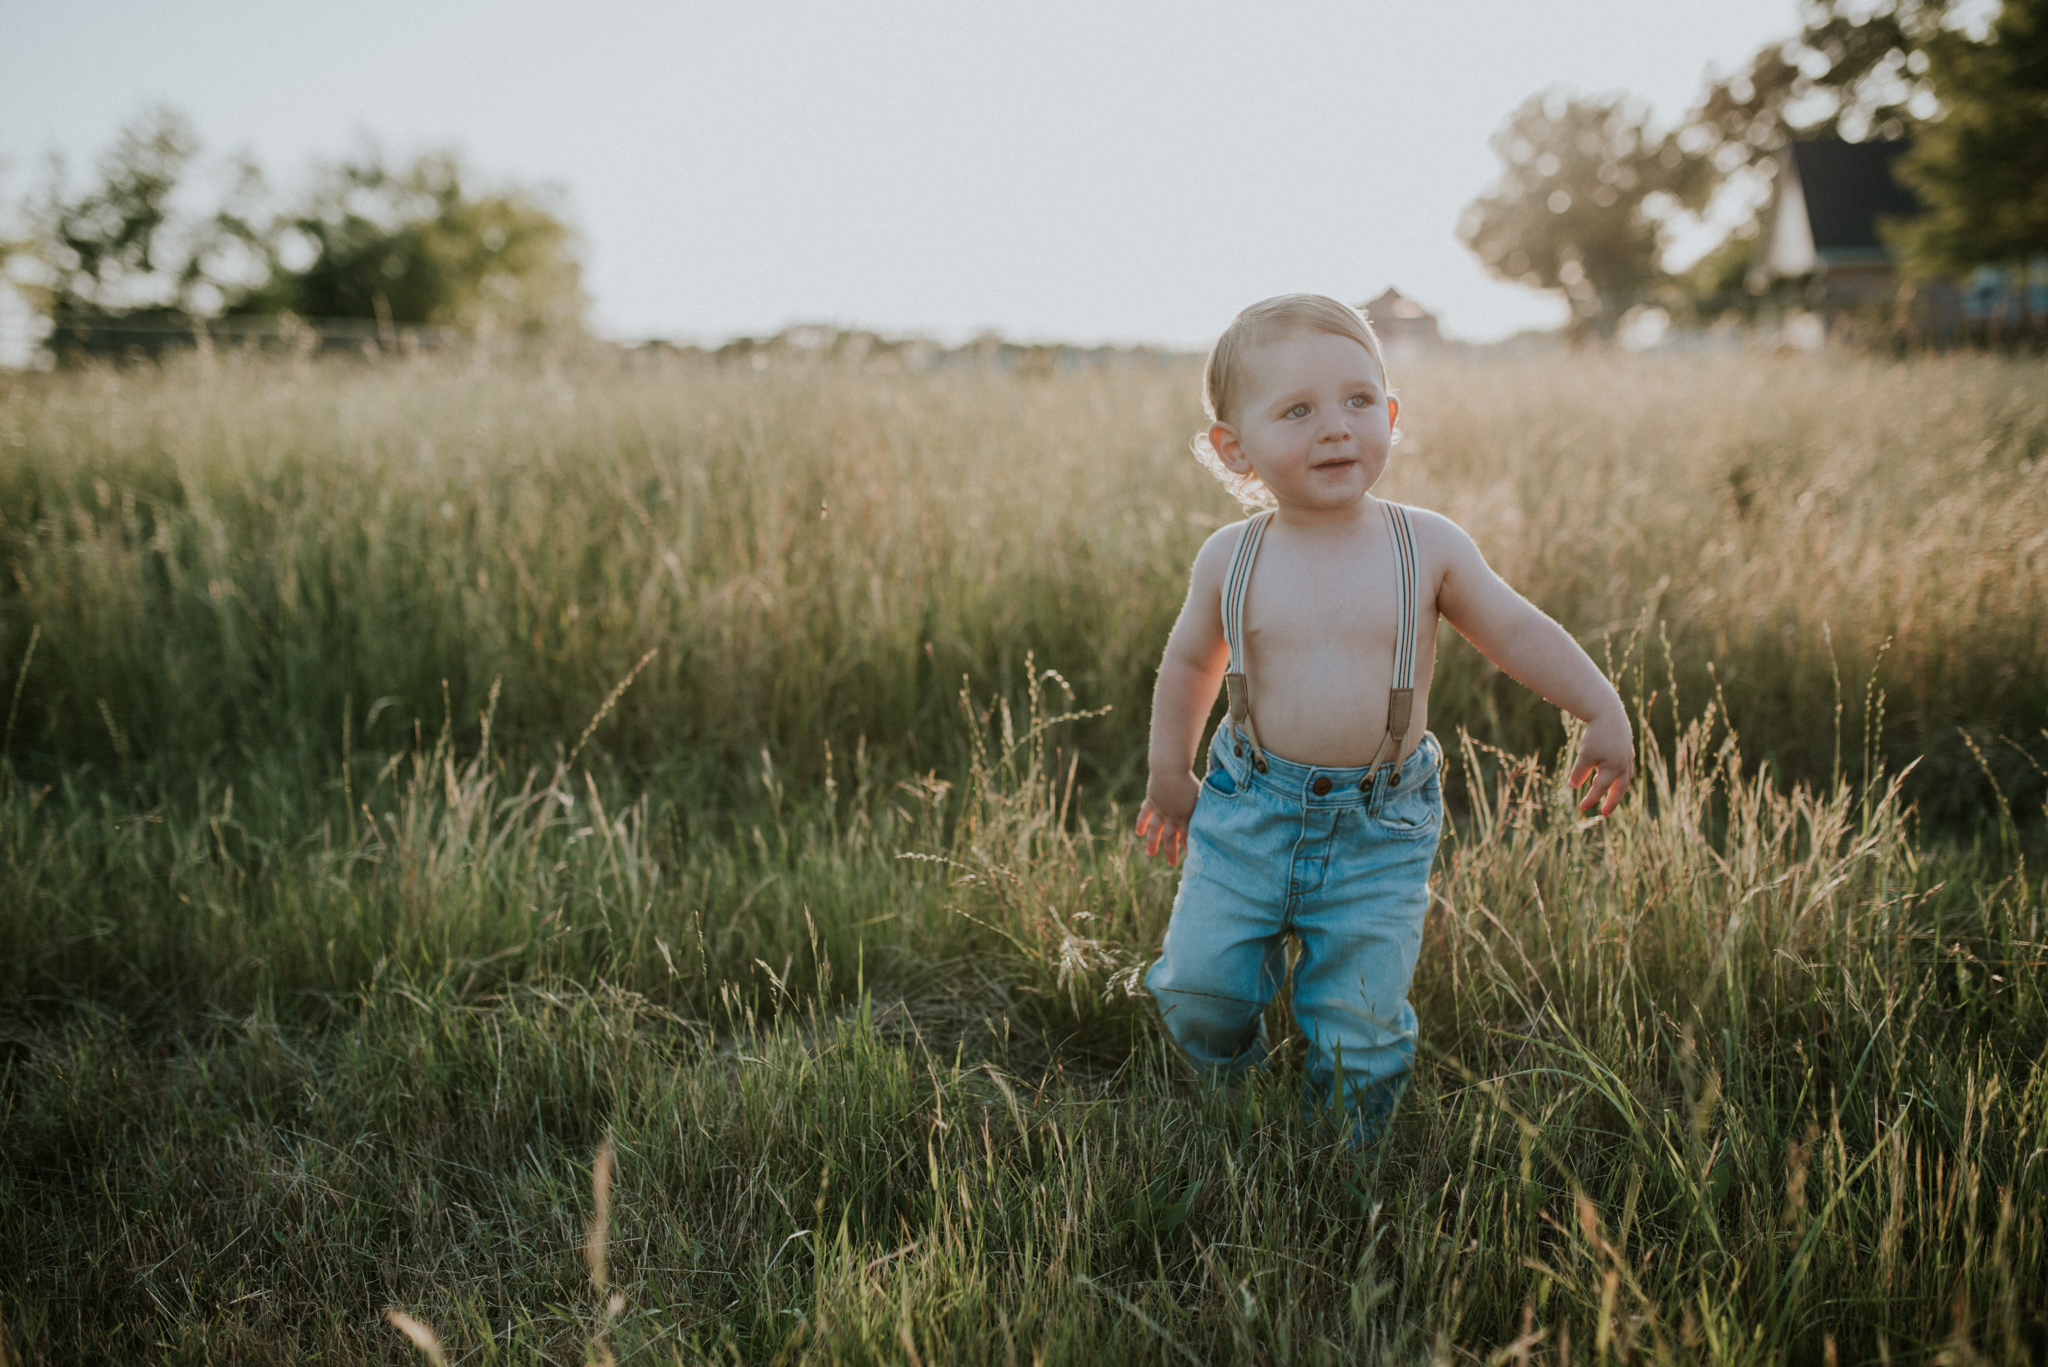 Graham-18 months-38.jpg